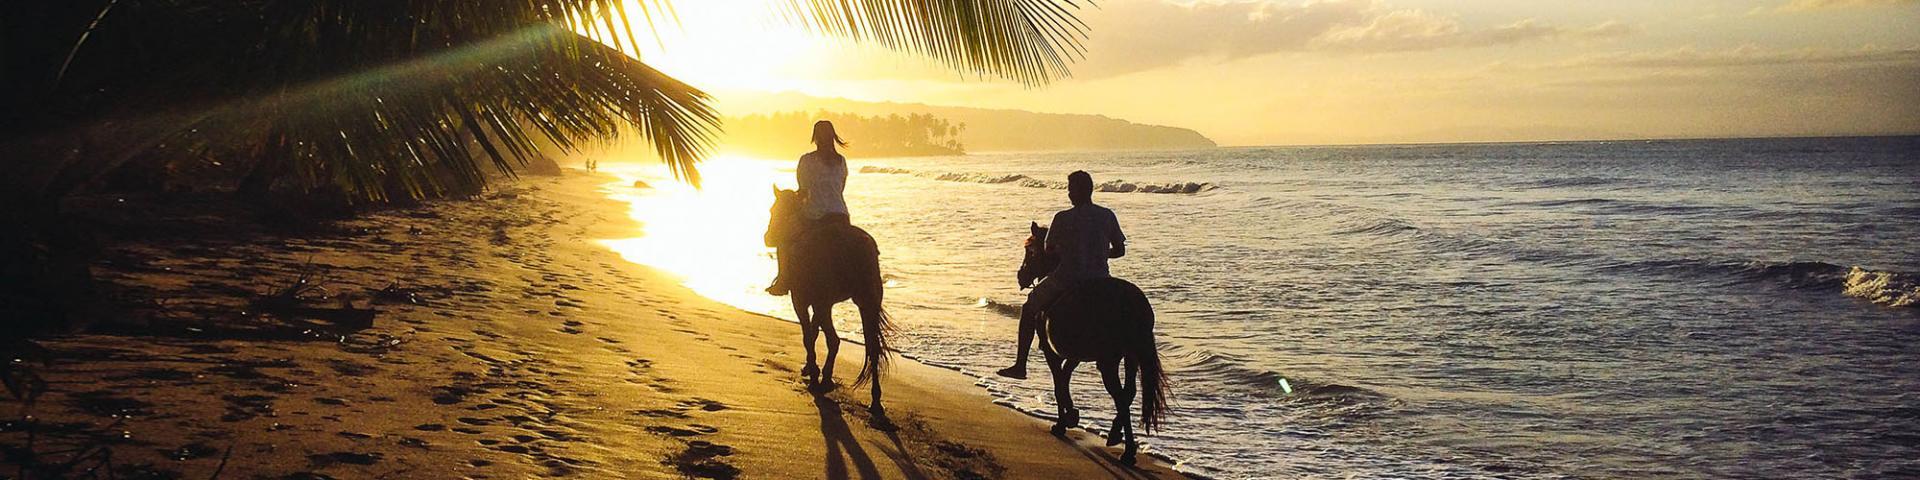 Horseback Riding Tour in Punta Cana